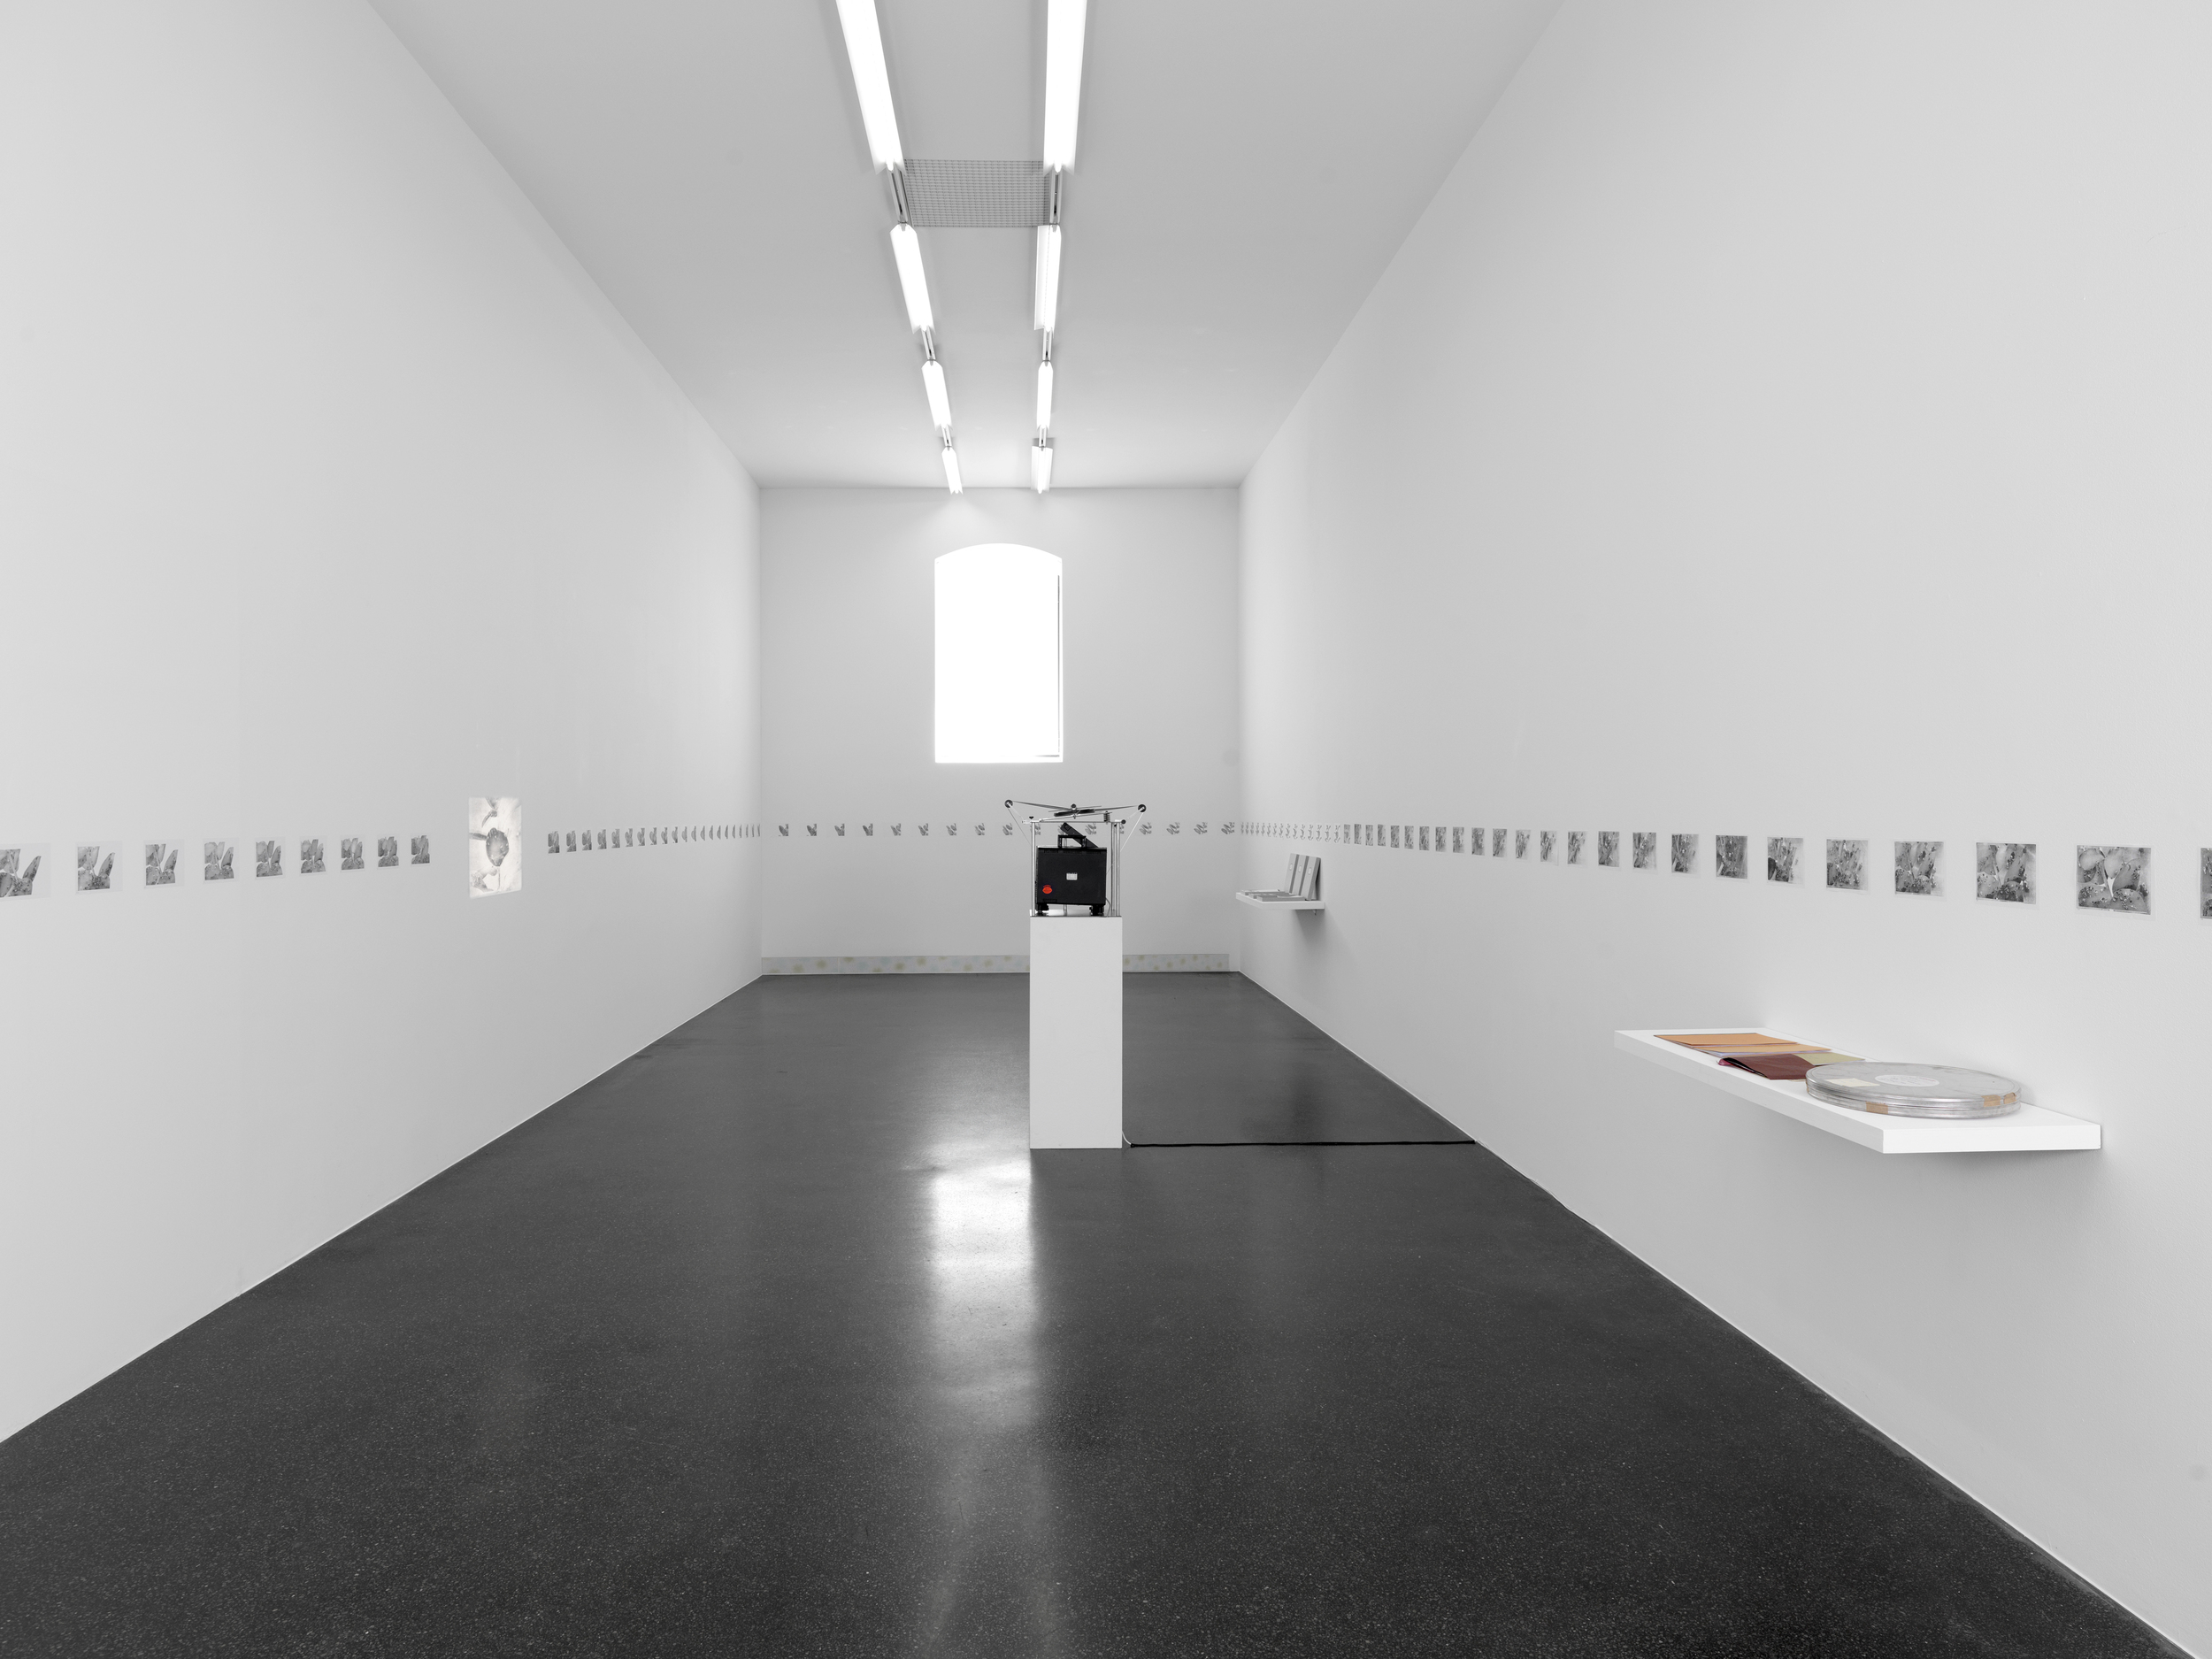 Galerie Francesca Pia, Zurich | Thomas Bayerle | 2014